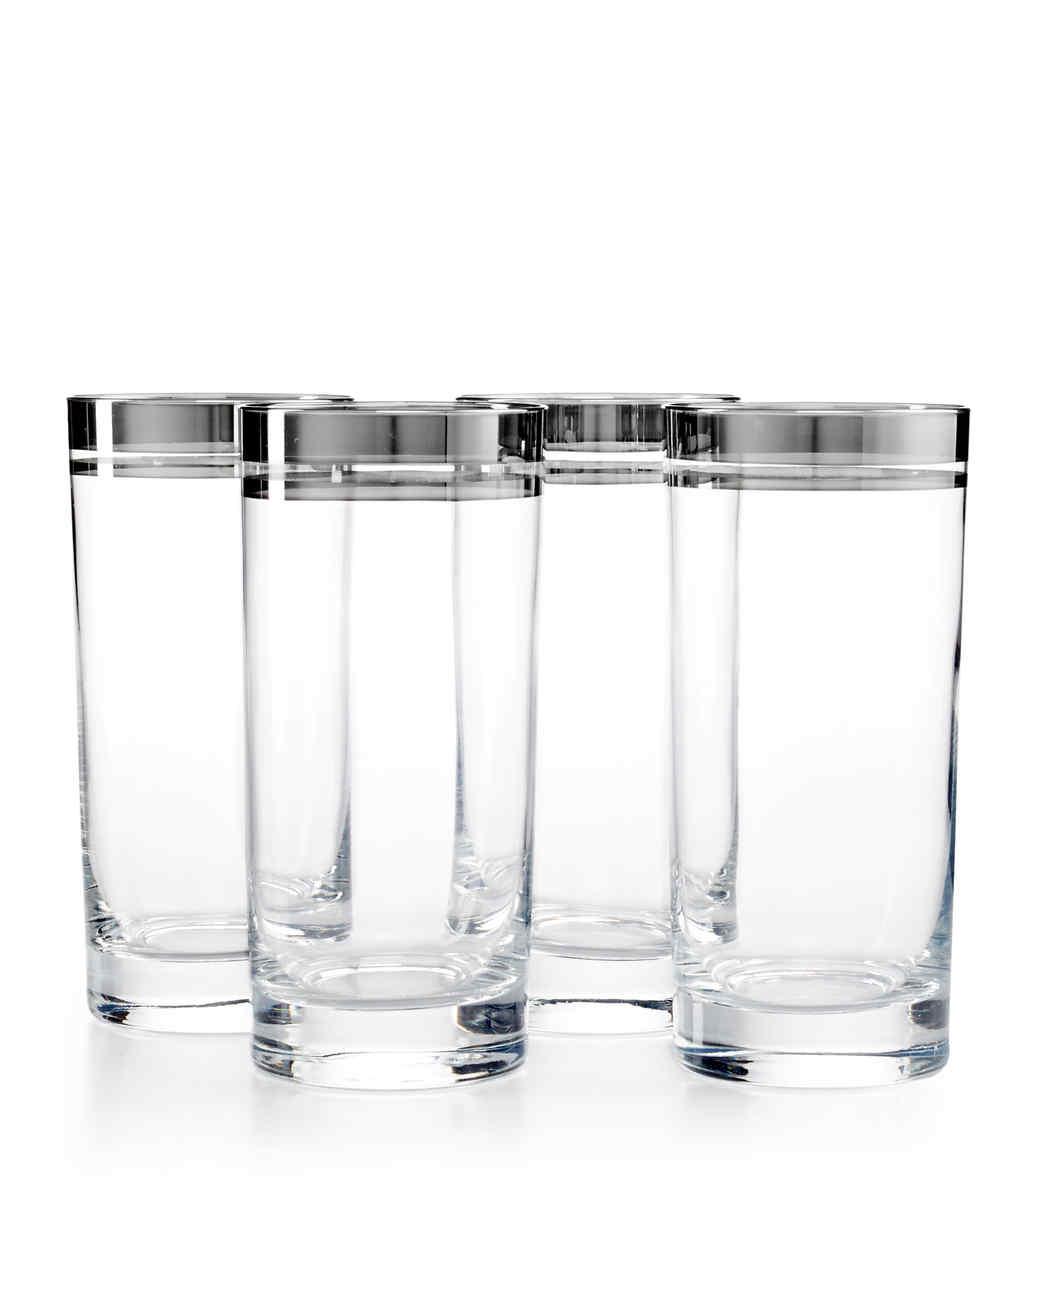 macys-glassware-platinumband-mrkt-0714.jpg